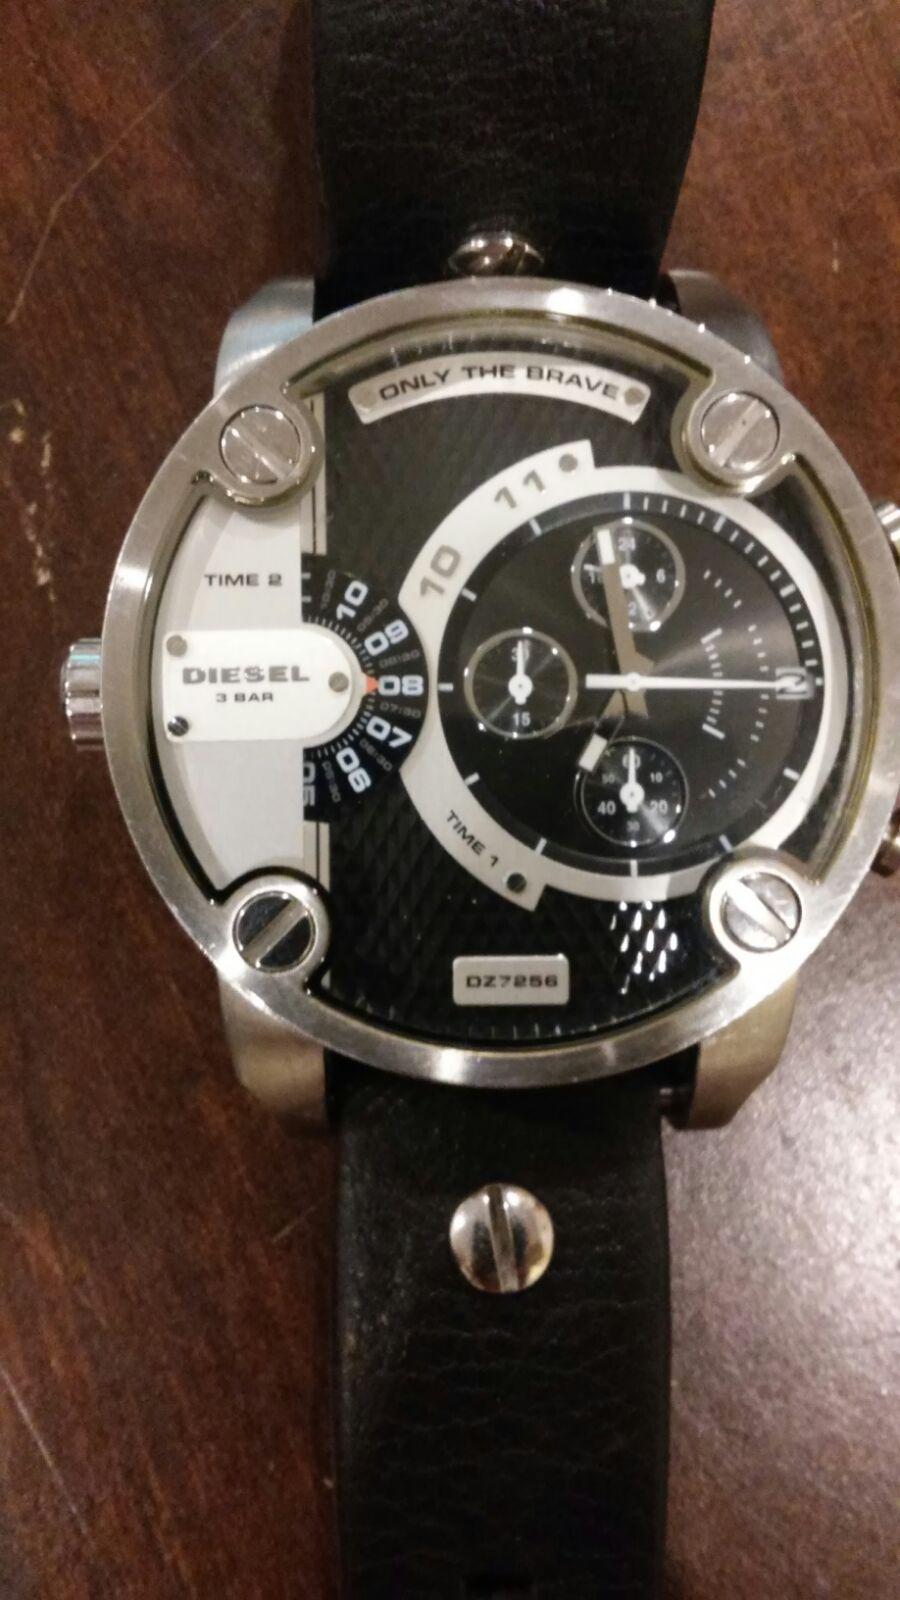 Sel 3 Bar Water Resistant Watch